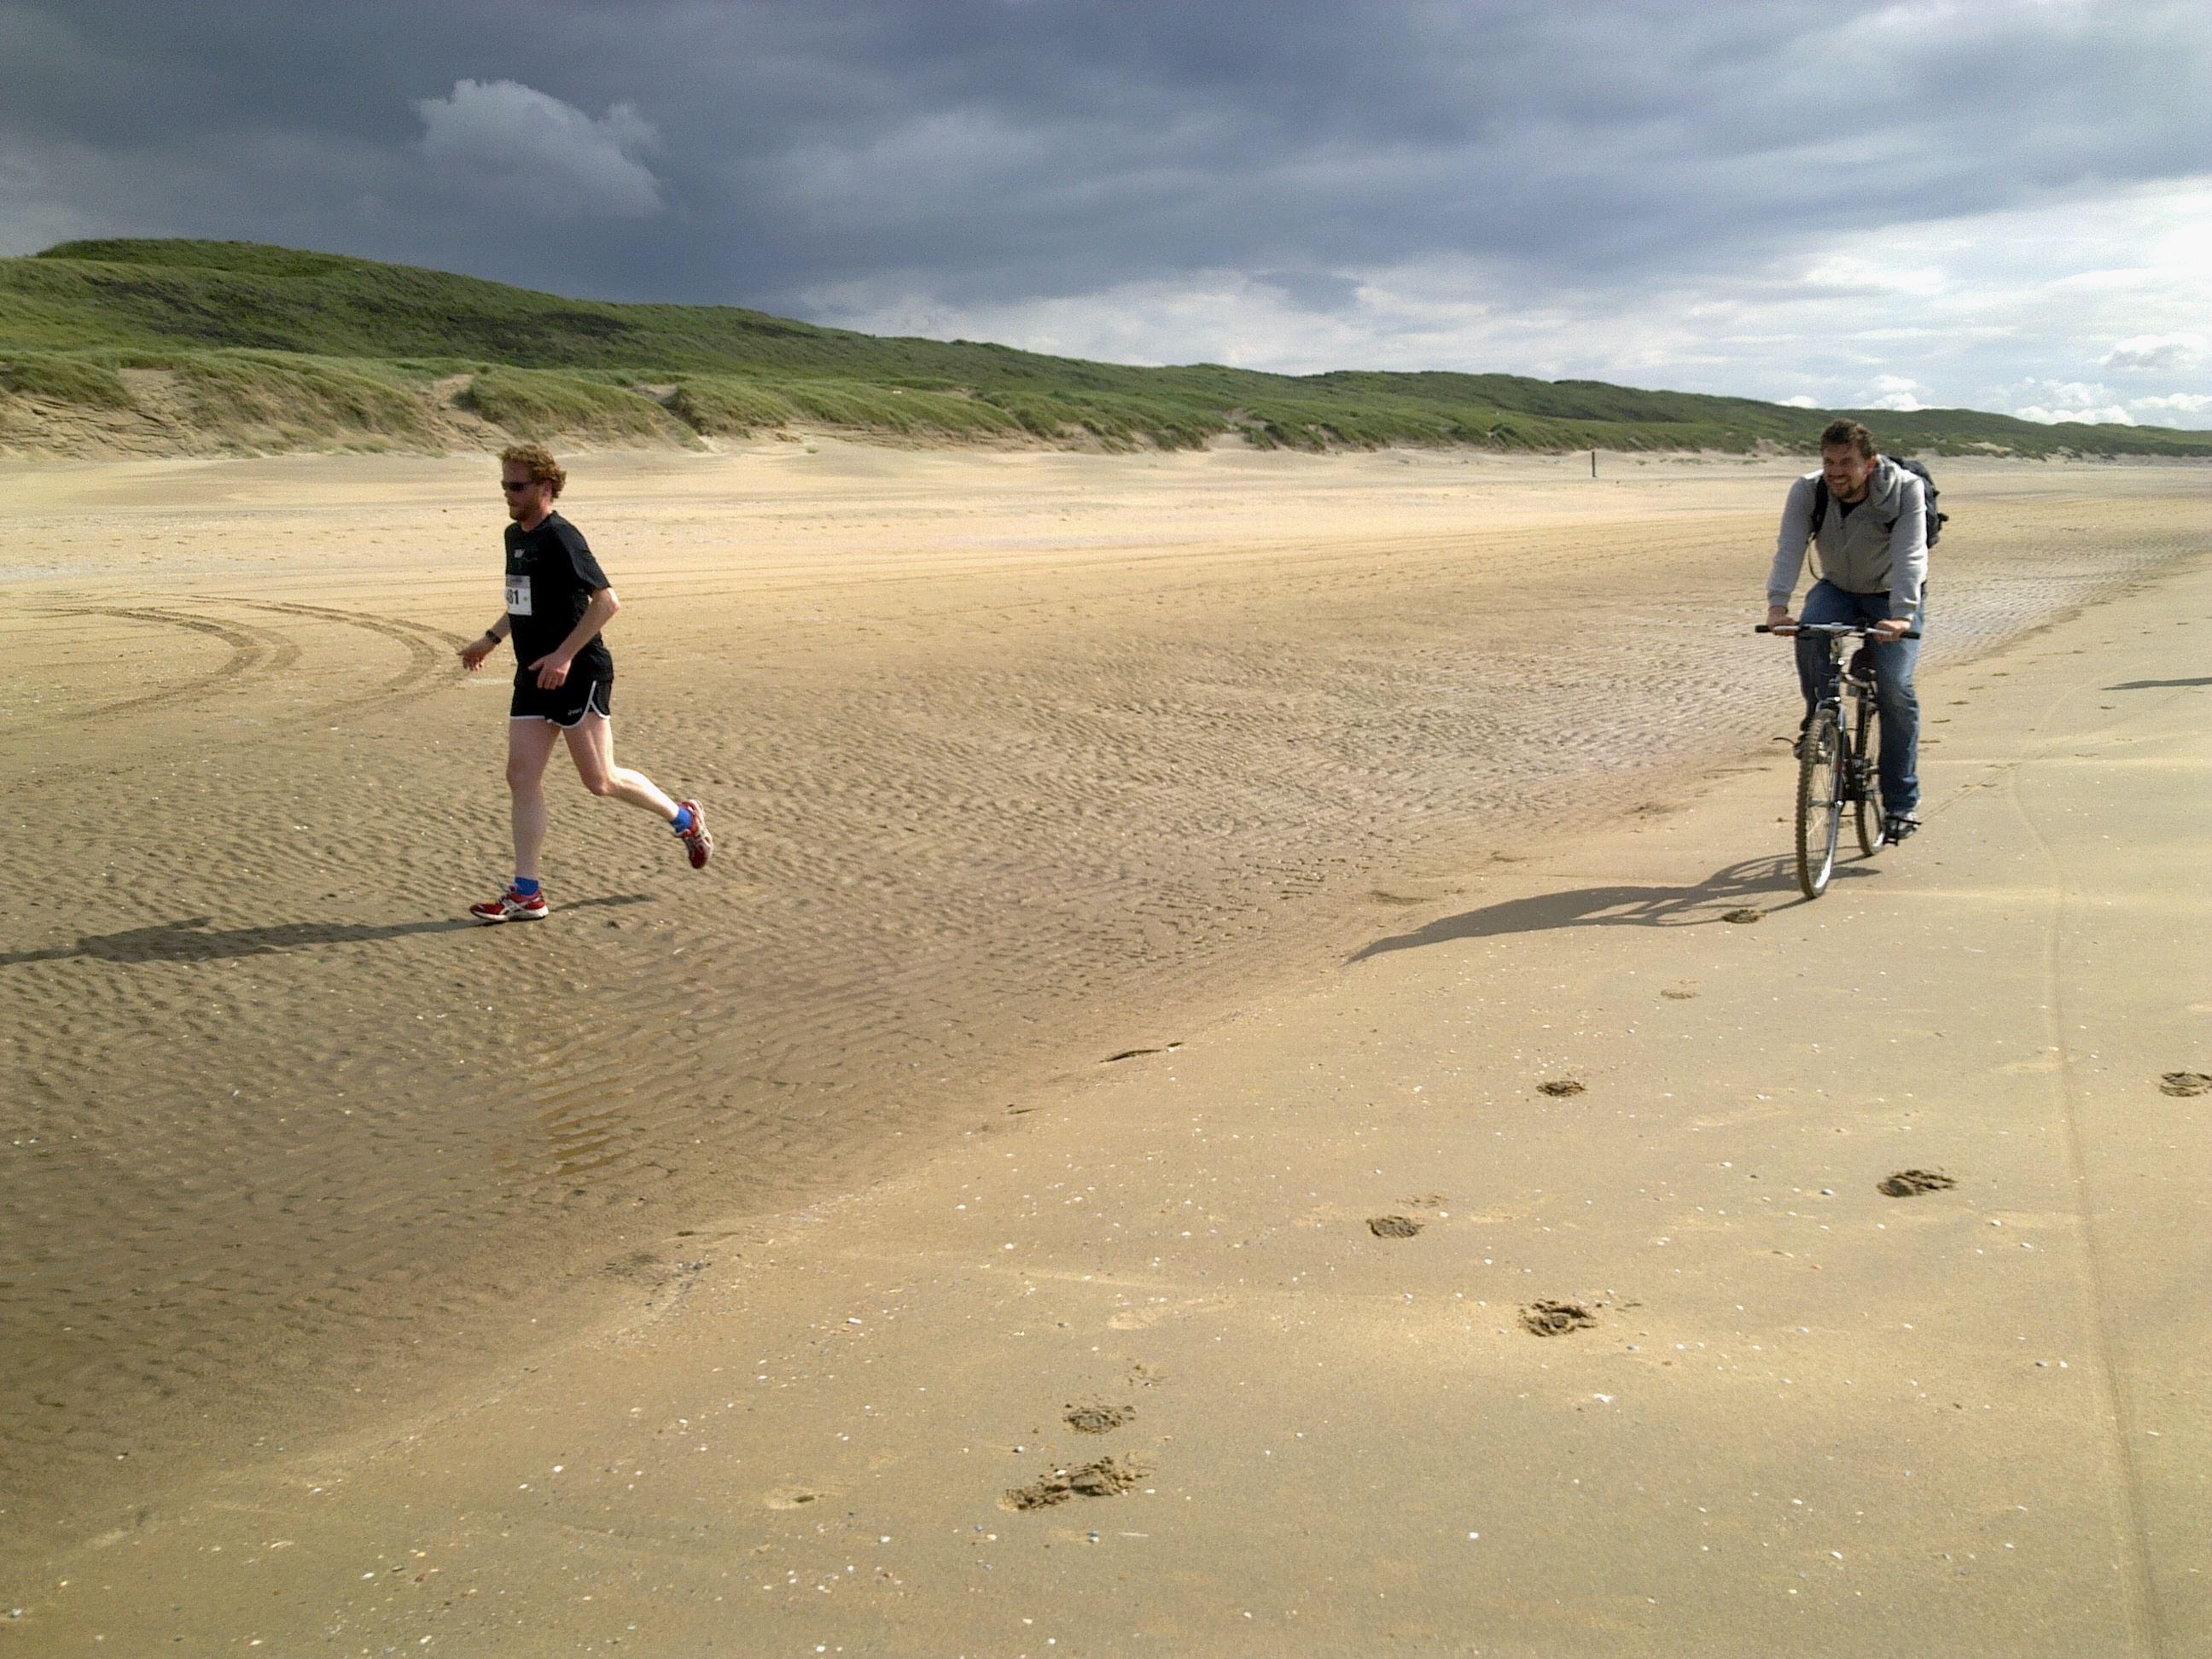 hague beach marathon